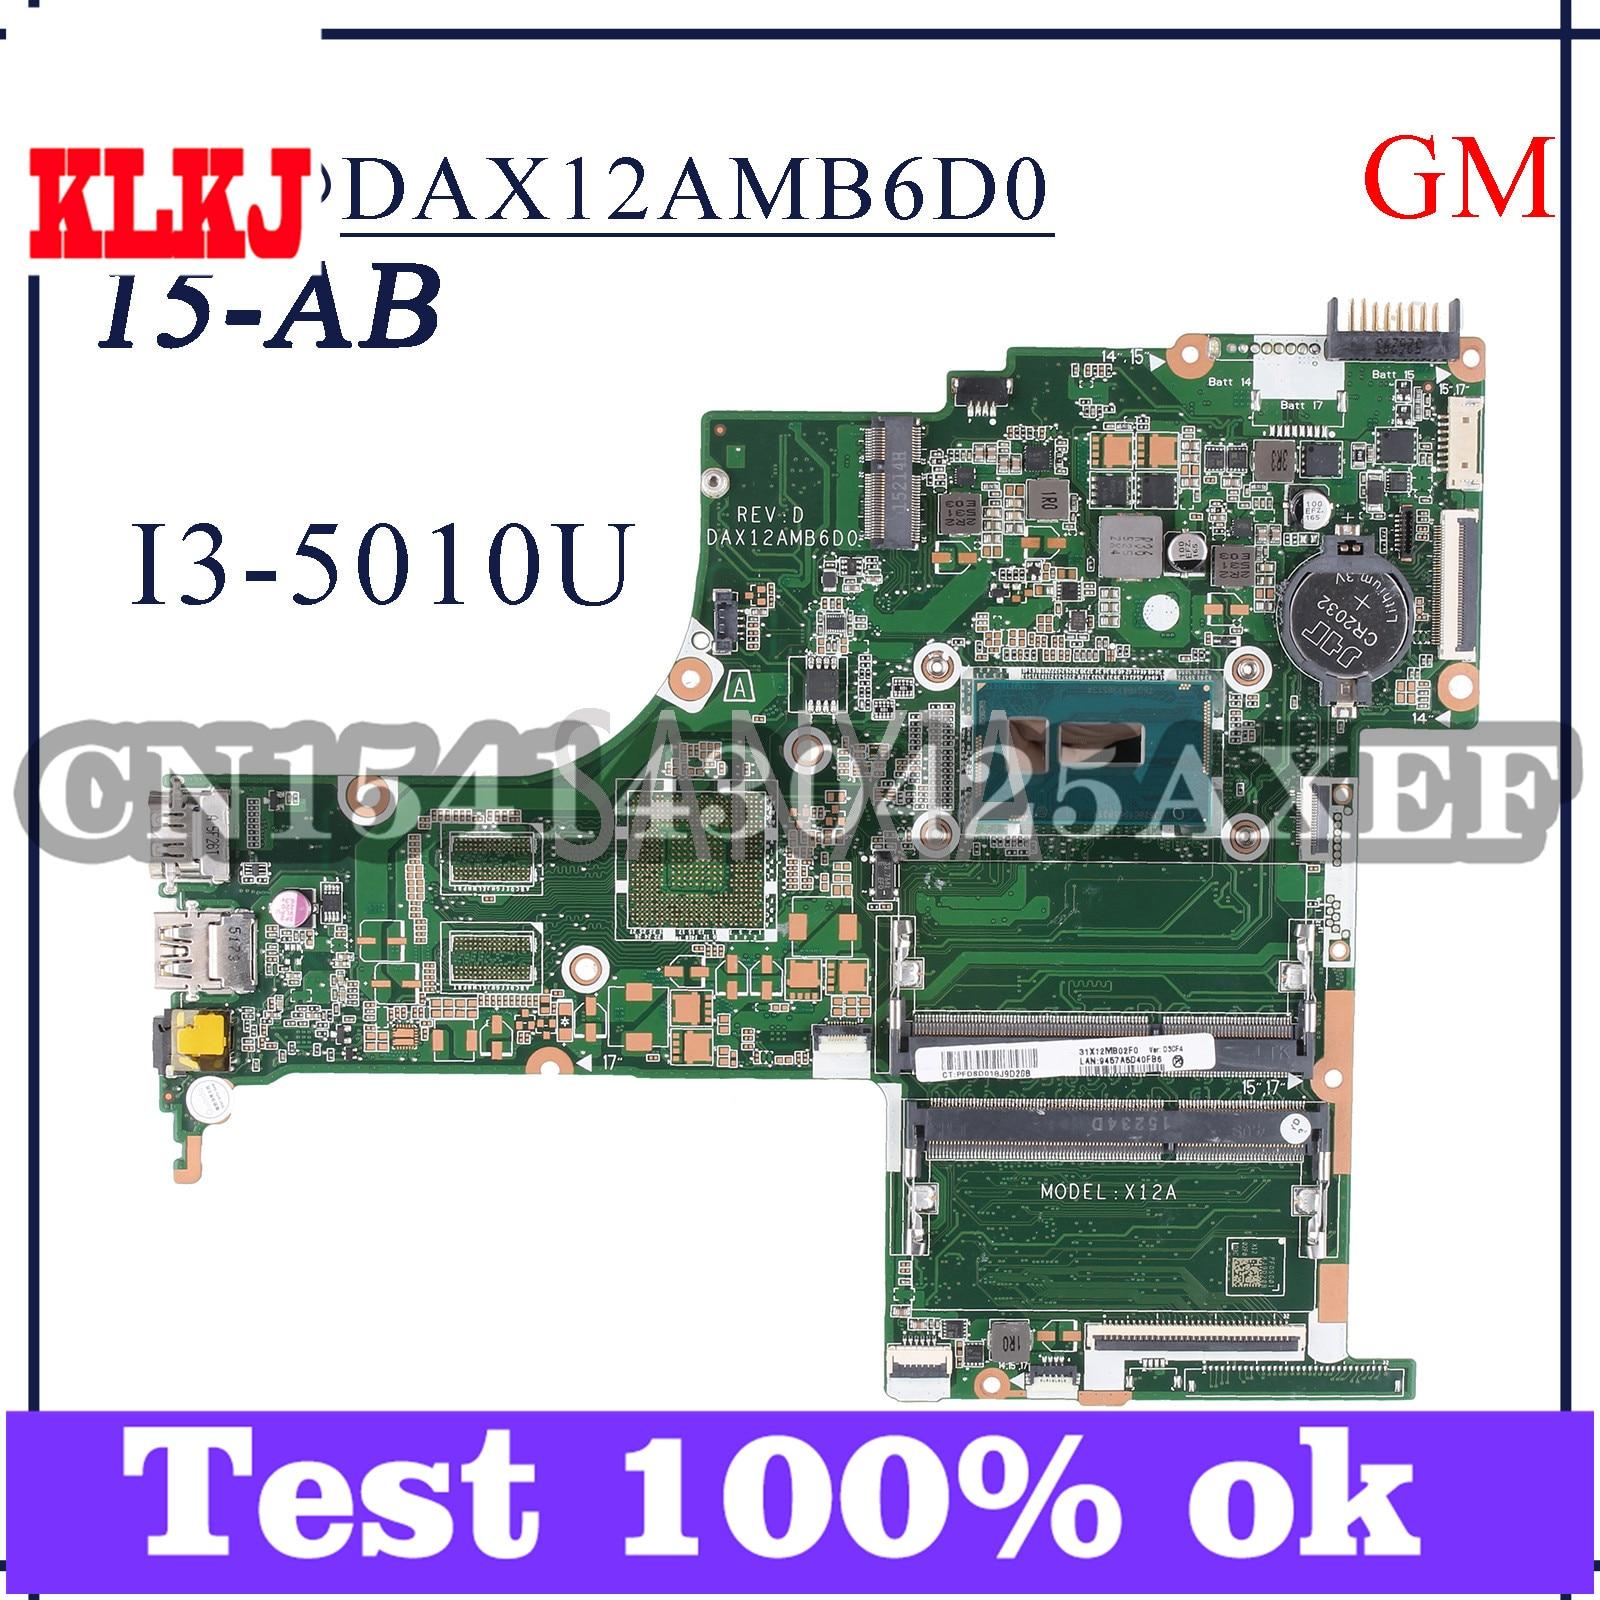 KLKJ DAX12AMB6D0 اللوحة الأم للكمبيوتر المحمول HP بافيليون 15-AB اللوحة الرئيسية الأصلية I3-5010U جنرال موتورز 809041-001 809041-501 809041-601